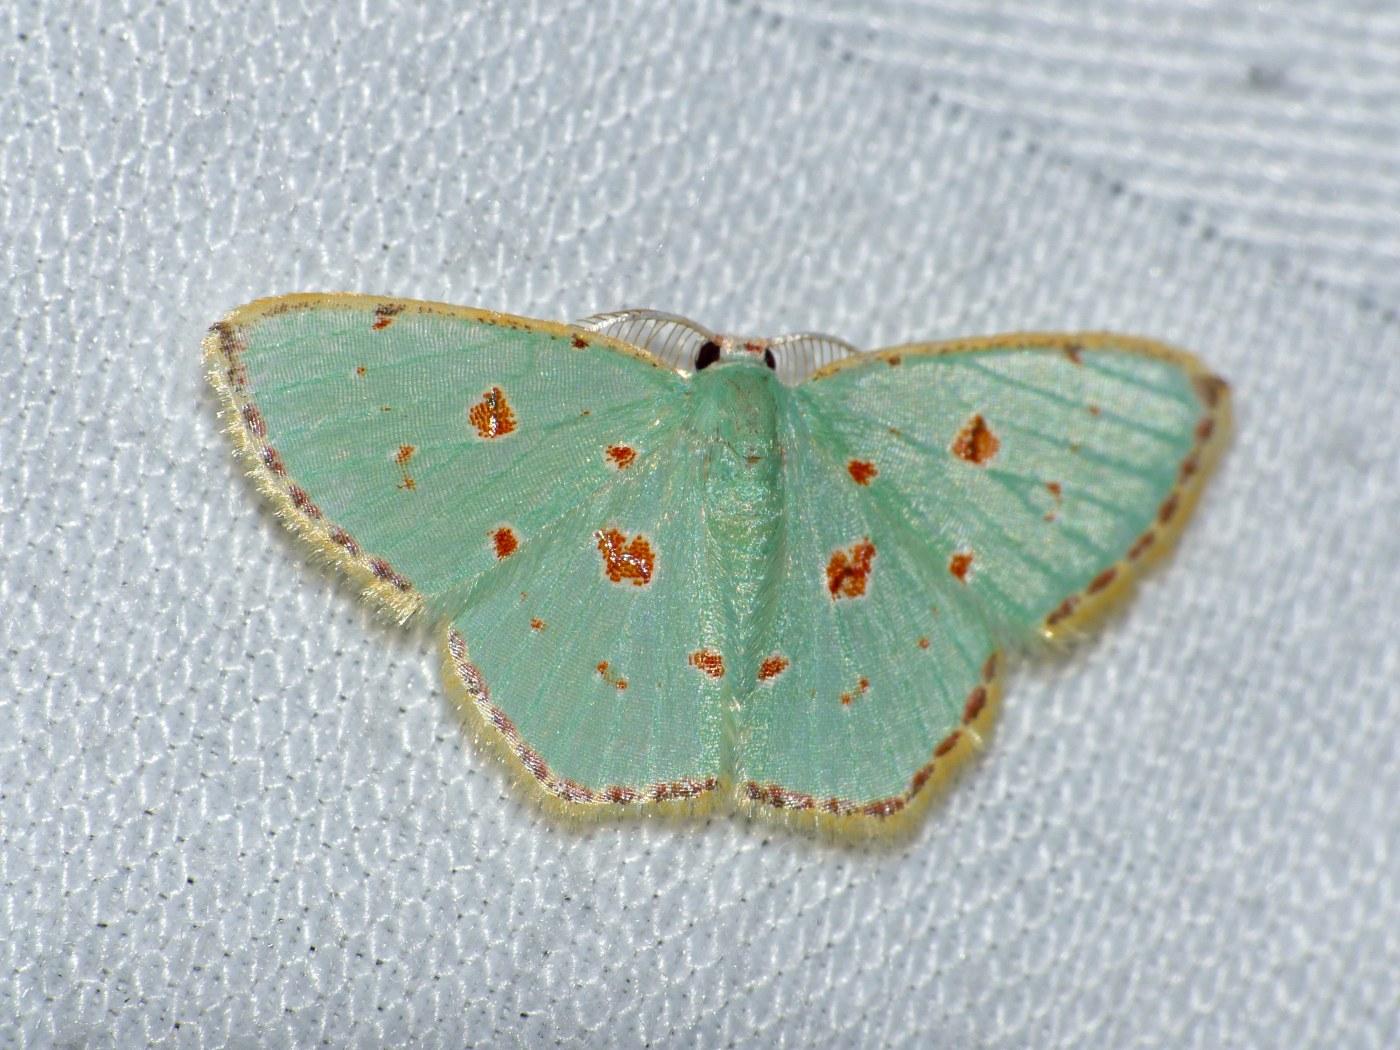 картинка: Geometrid_Moth__Comostola_laesaria__male__15691511259_.jpg